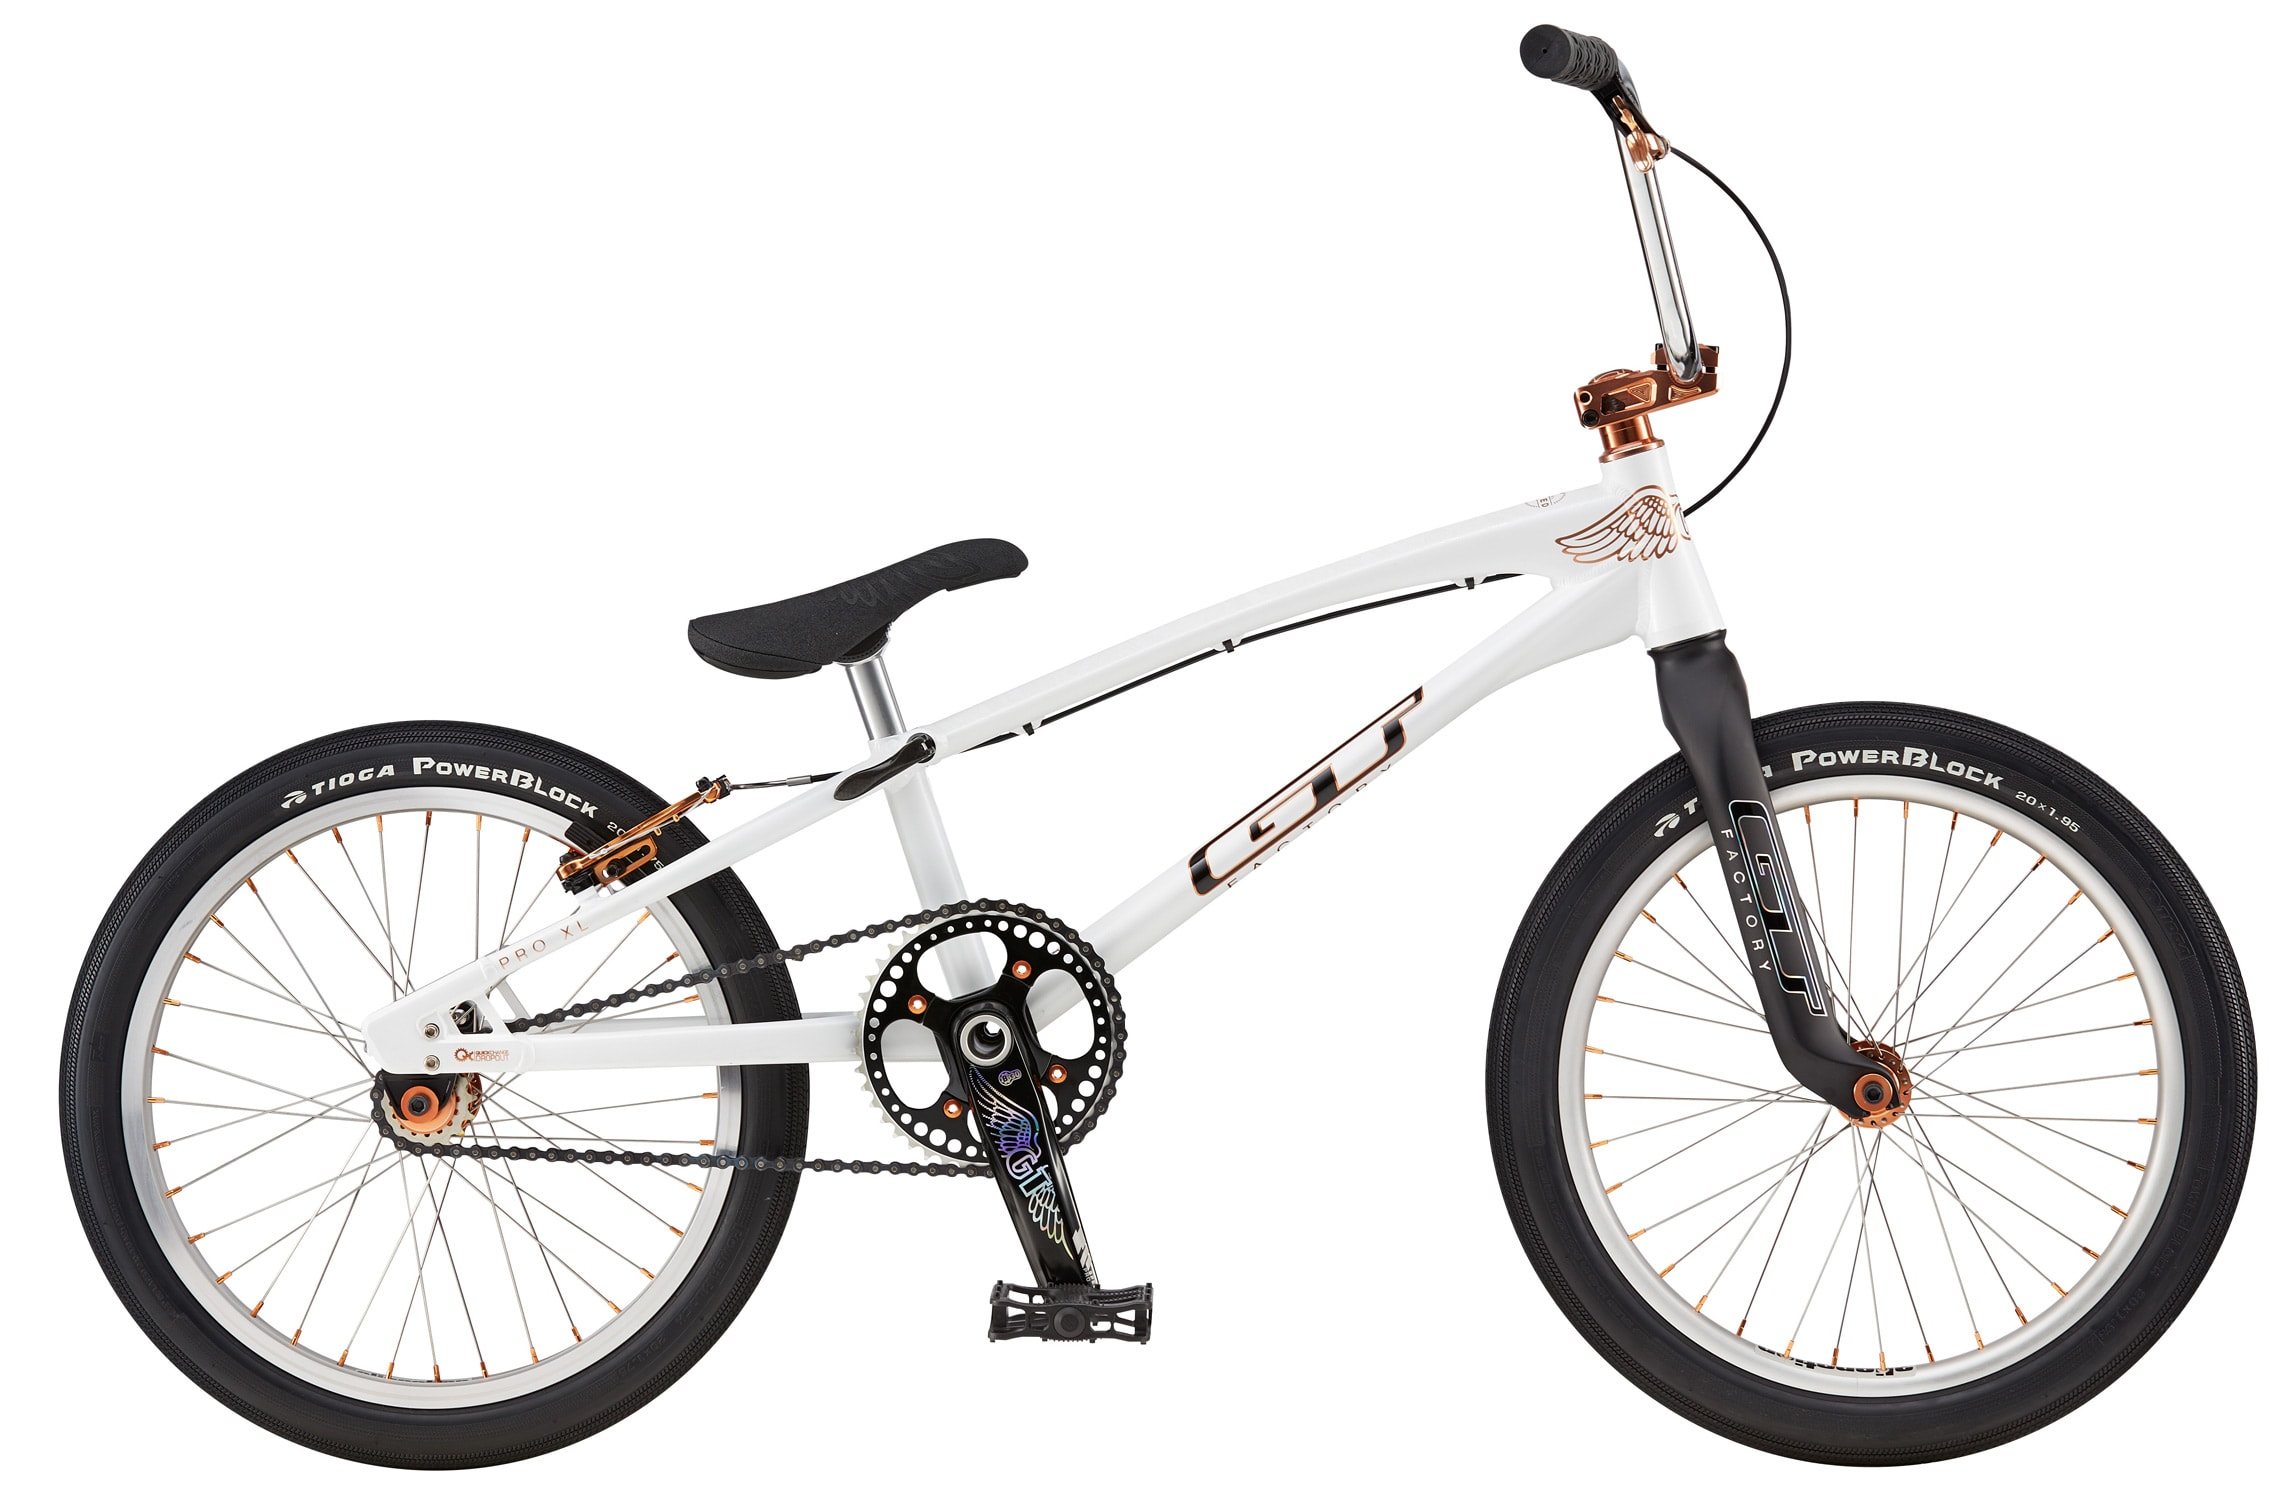 Gt Speed Series Pro Bmx Bike